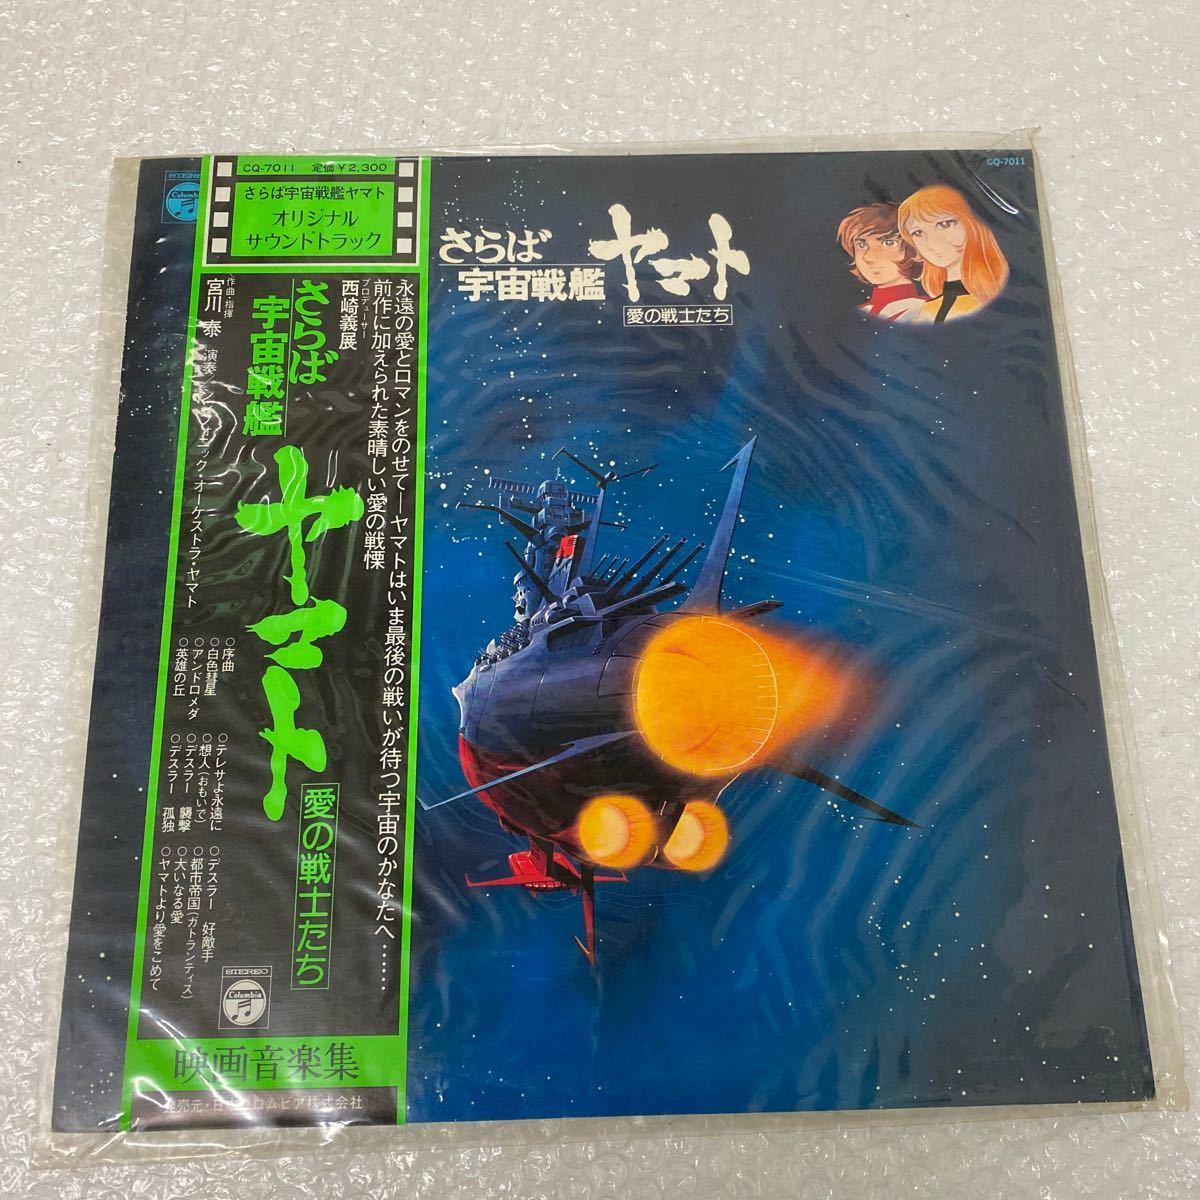 【LP】さらば宇宙戦艦ヤマト 愛の戦士たち 映画音楽集/オリジナルサウンドトラック(CQ-7011)日本コロムビア_画像1